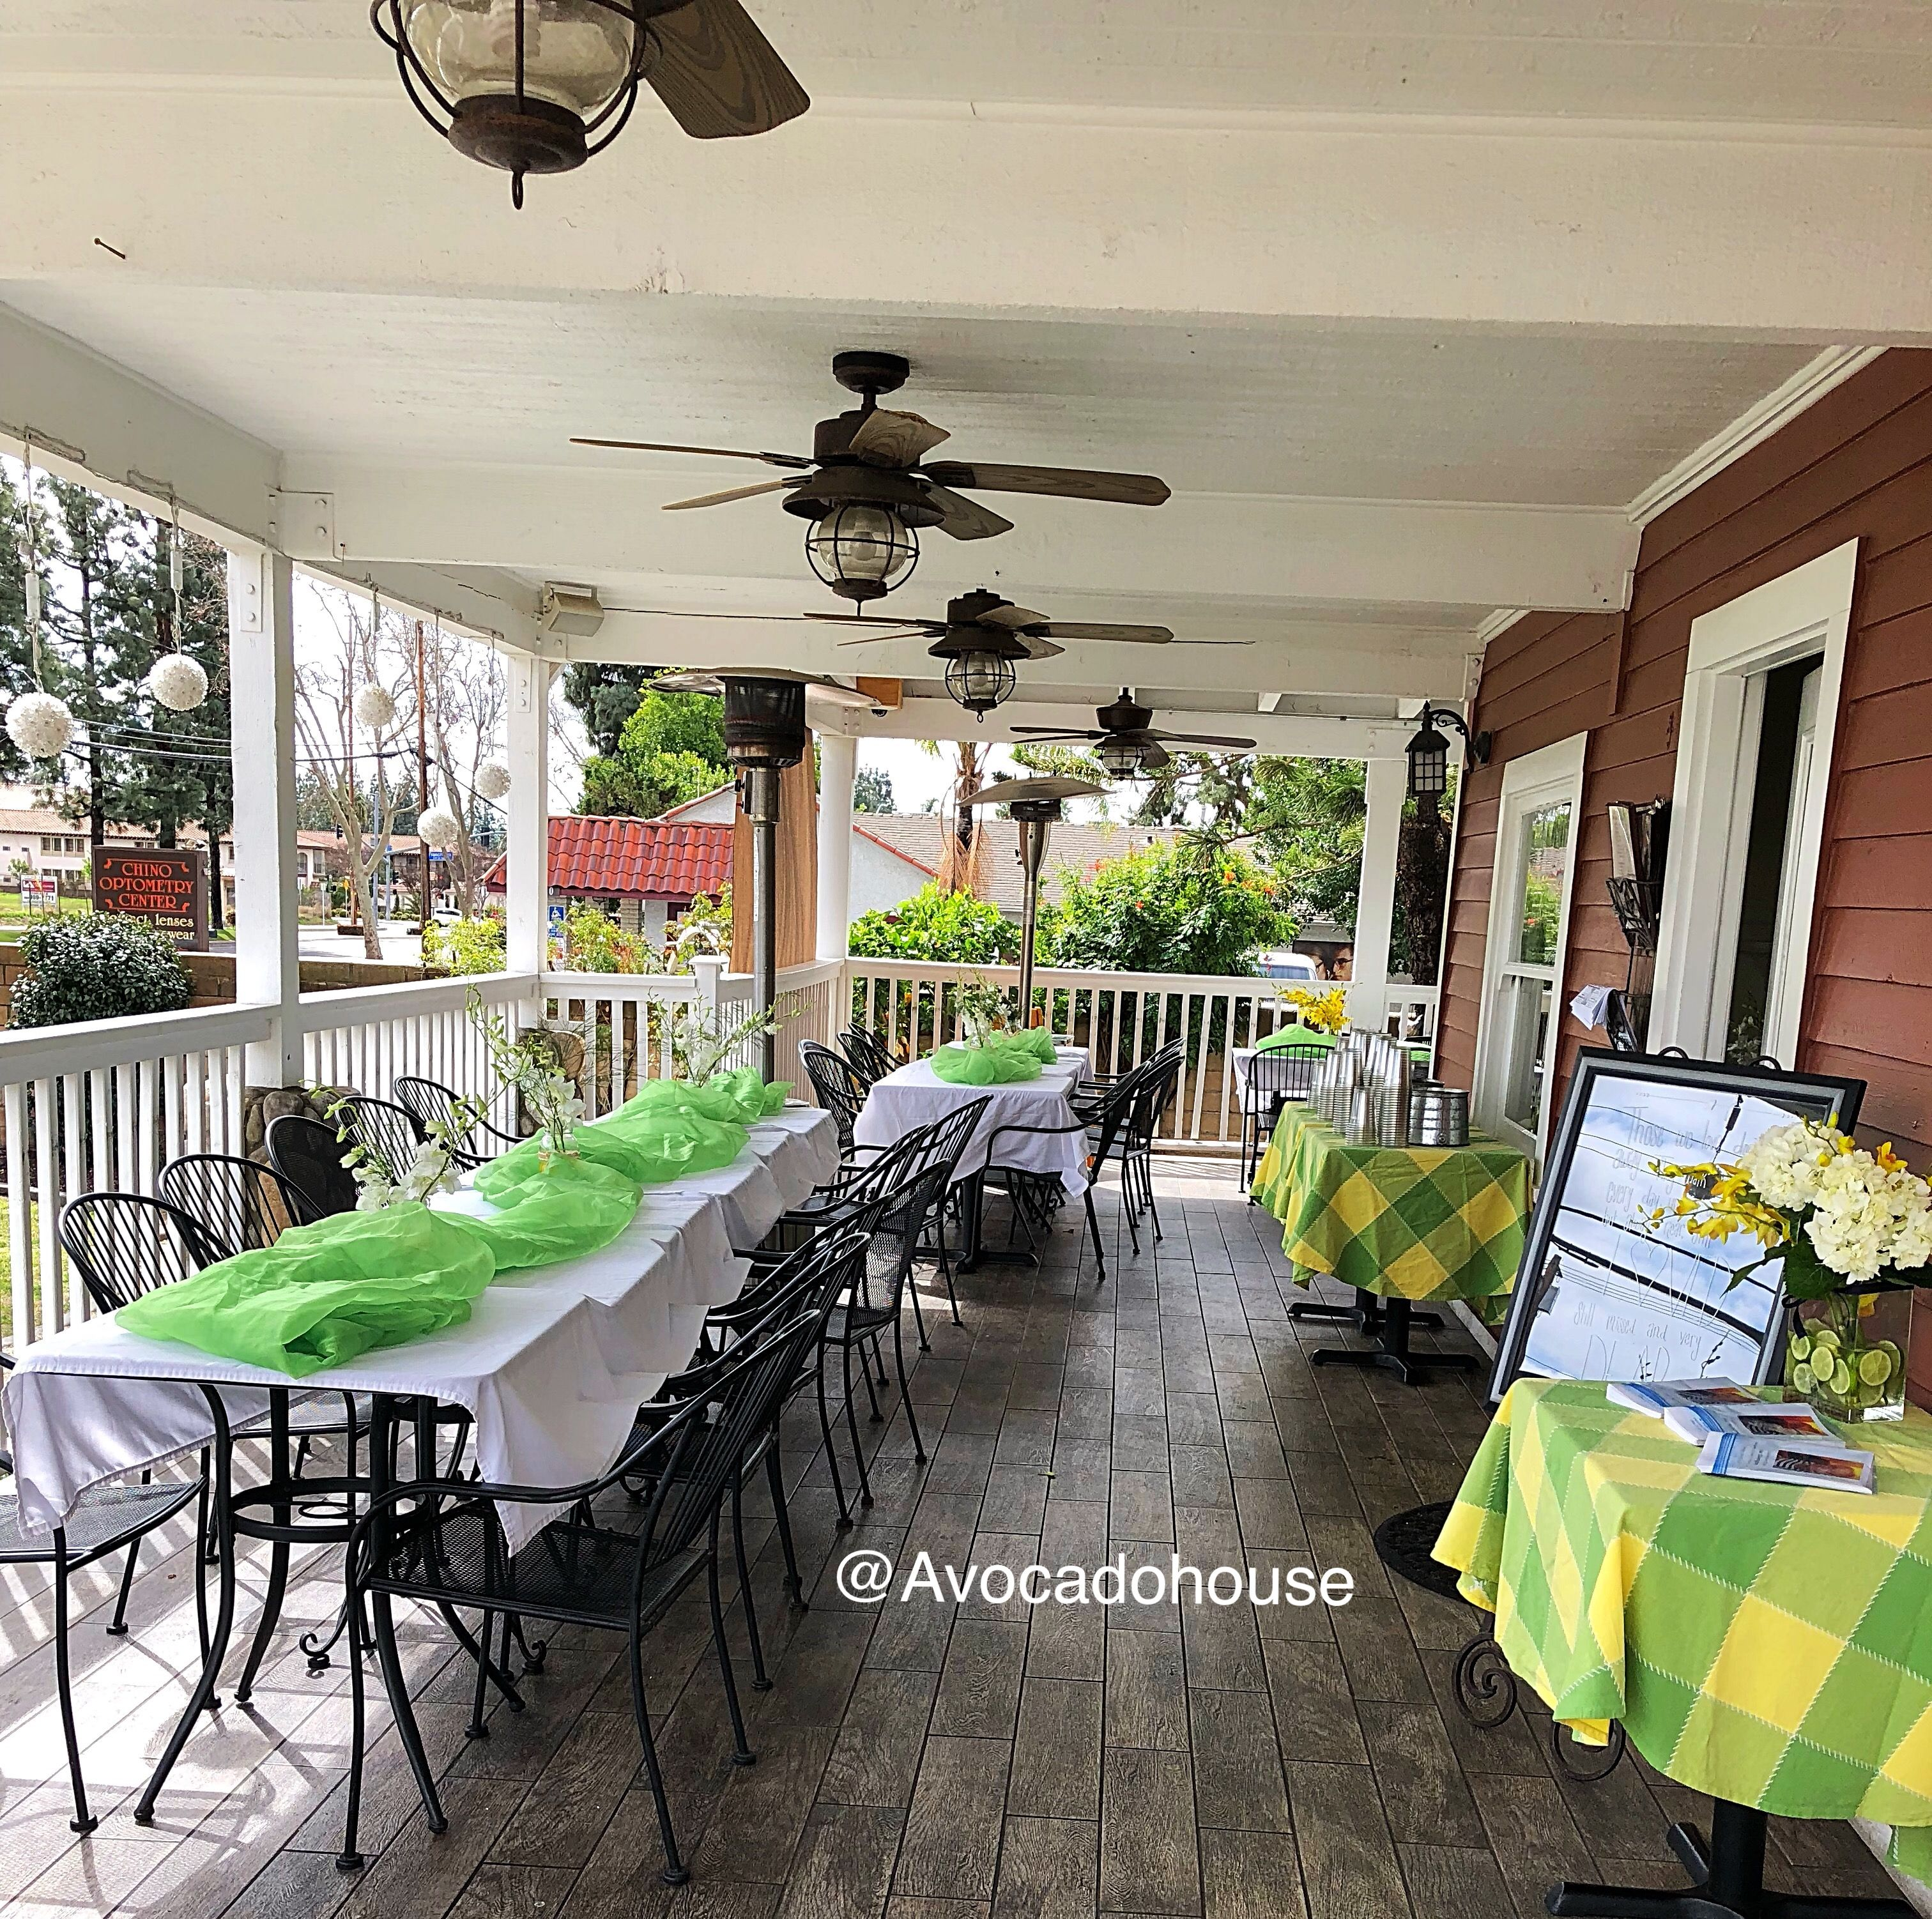 A Celebration Of Life Catered Service Outdoor Decor Patio Umbrella Patio